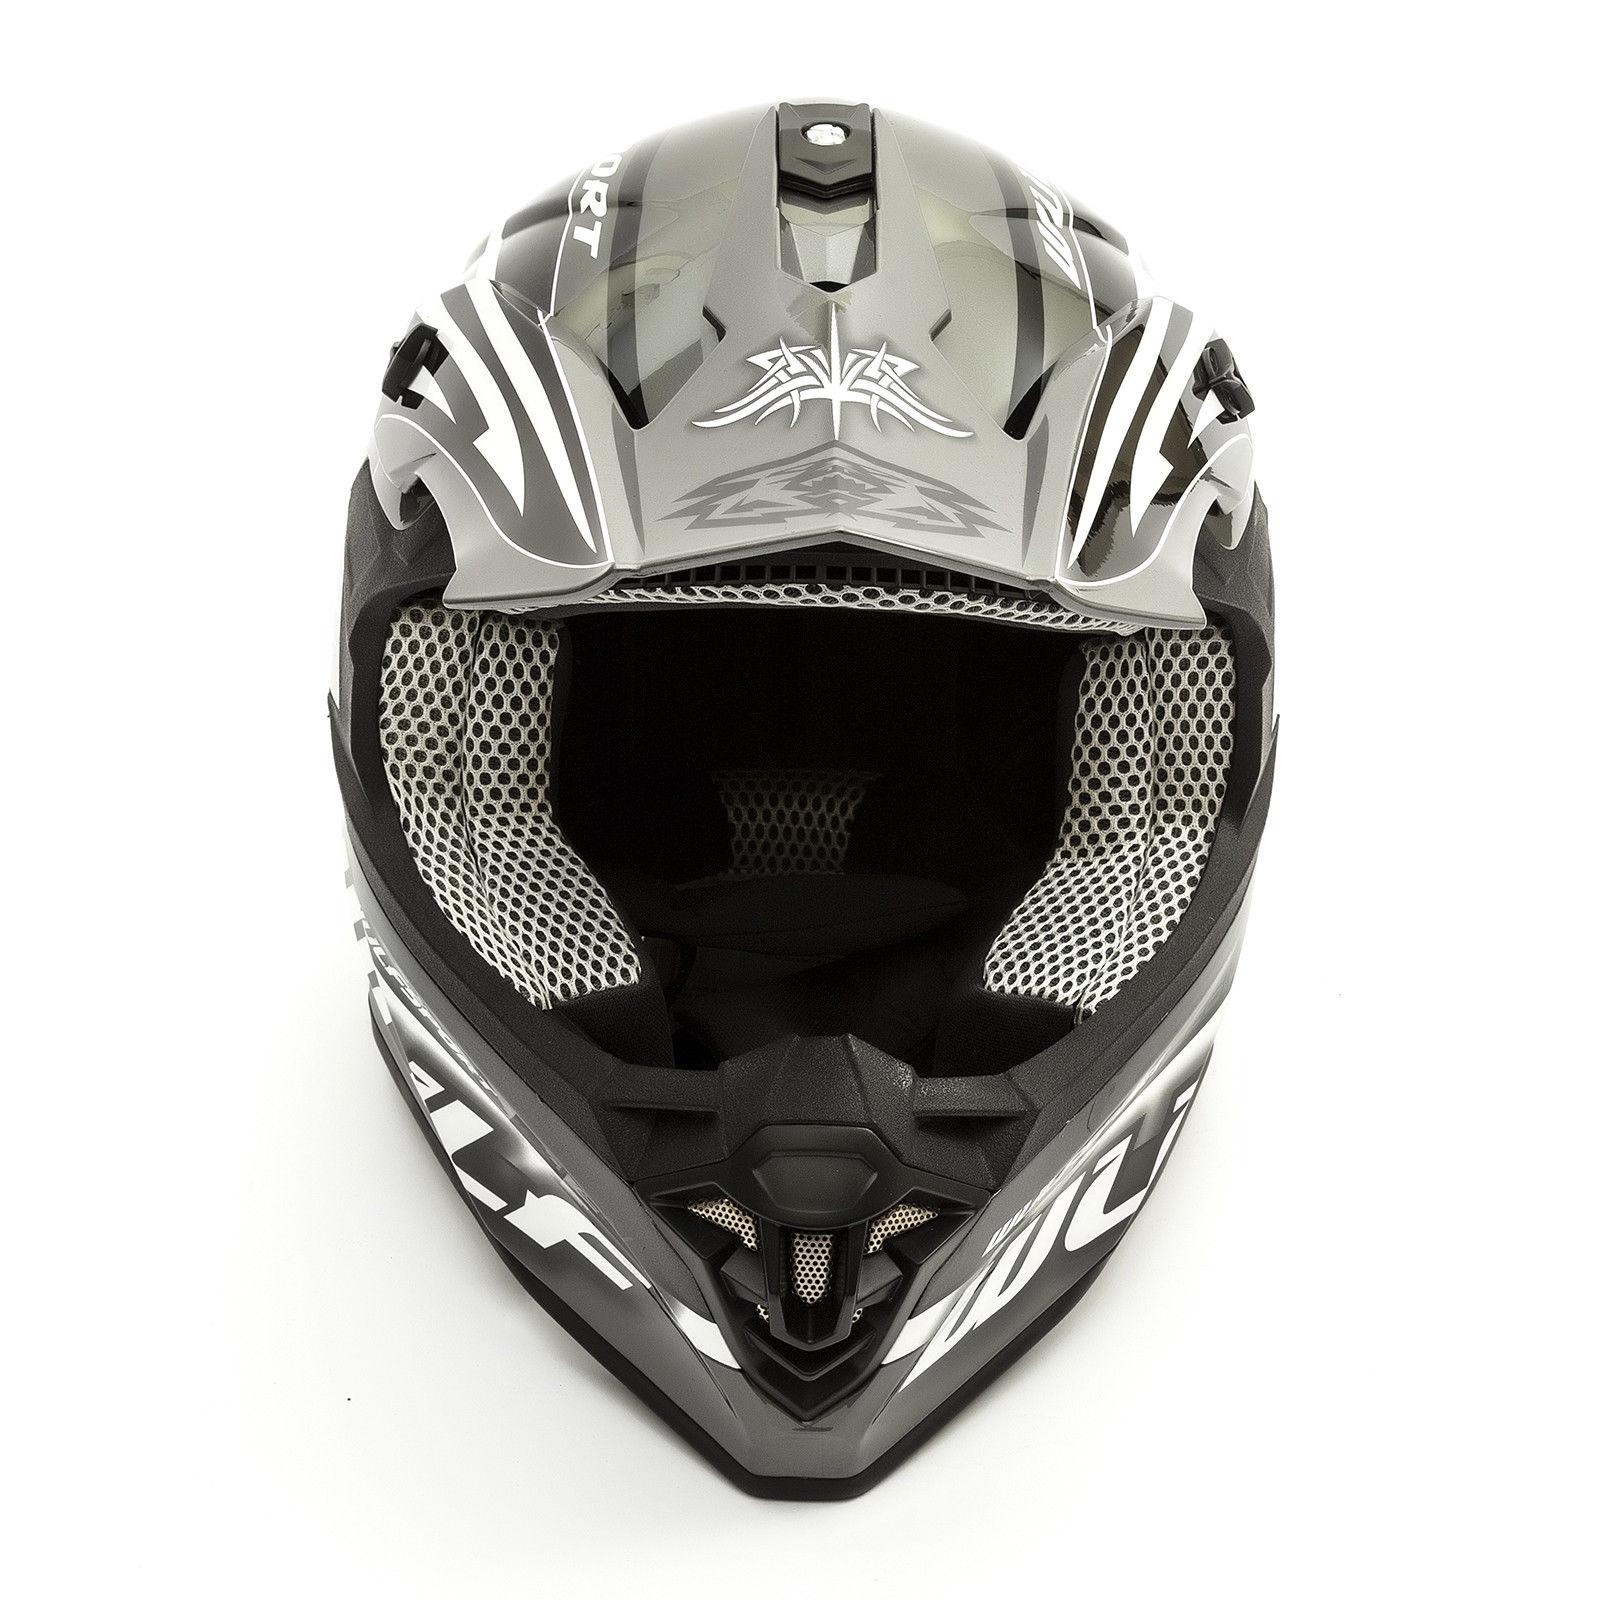 Wulfsport-Adult-Sceptre-Helmets-Motocross-Pitbike-Motorbike-Off-Road-Racing-ATV thumbnail 10